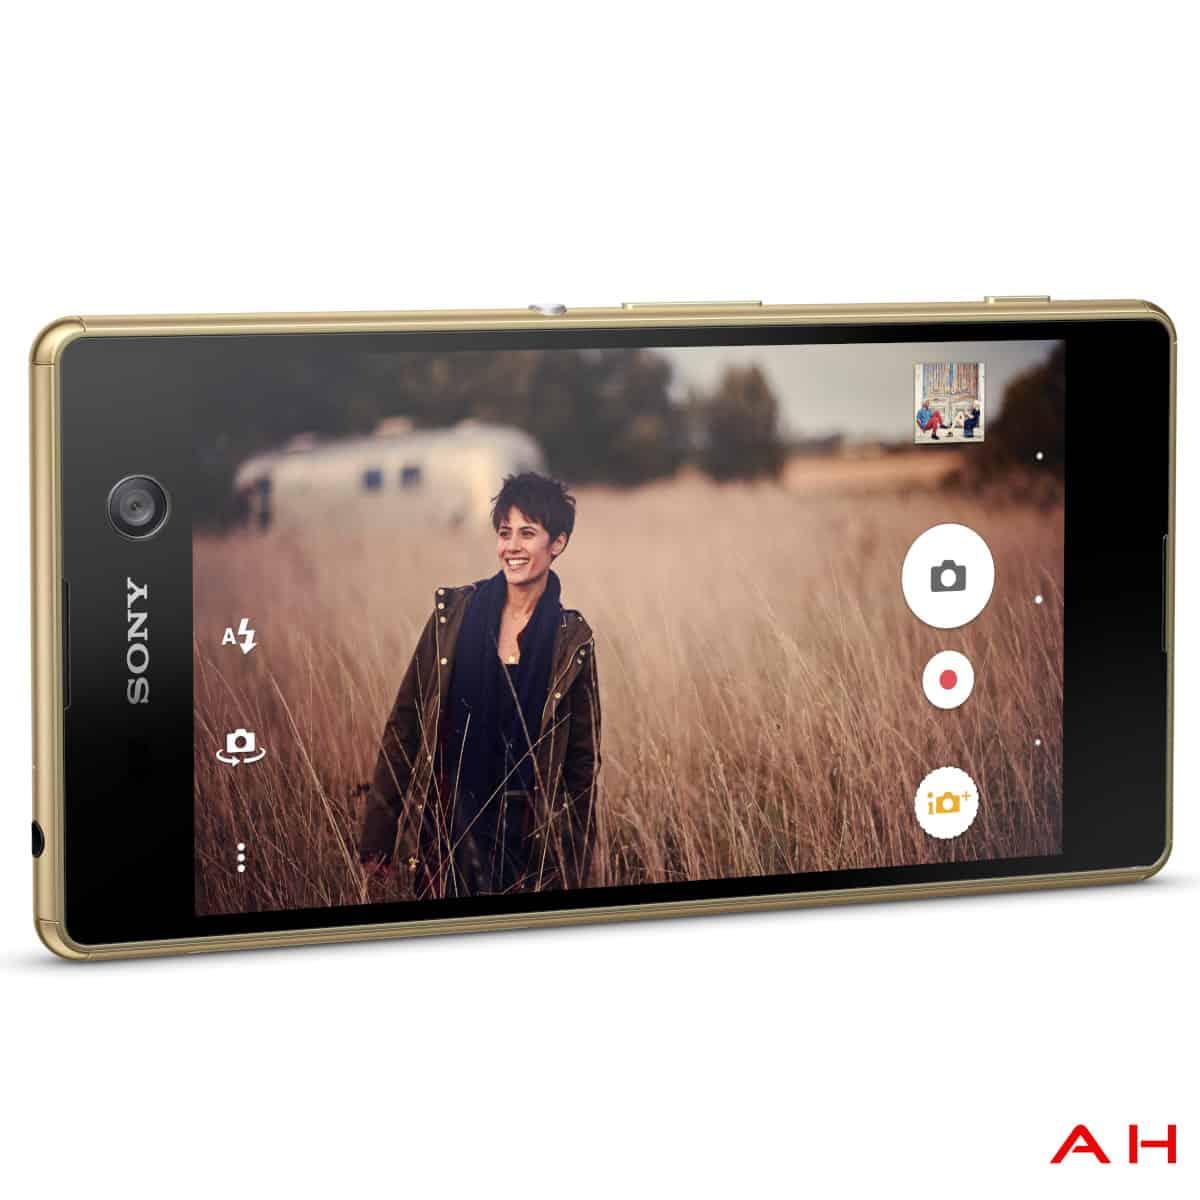 AH Sony Xperia M5 Press Images 3